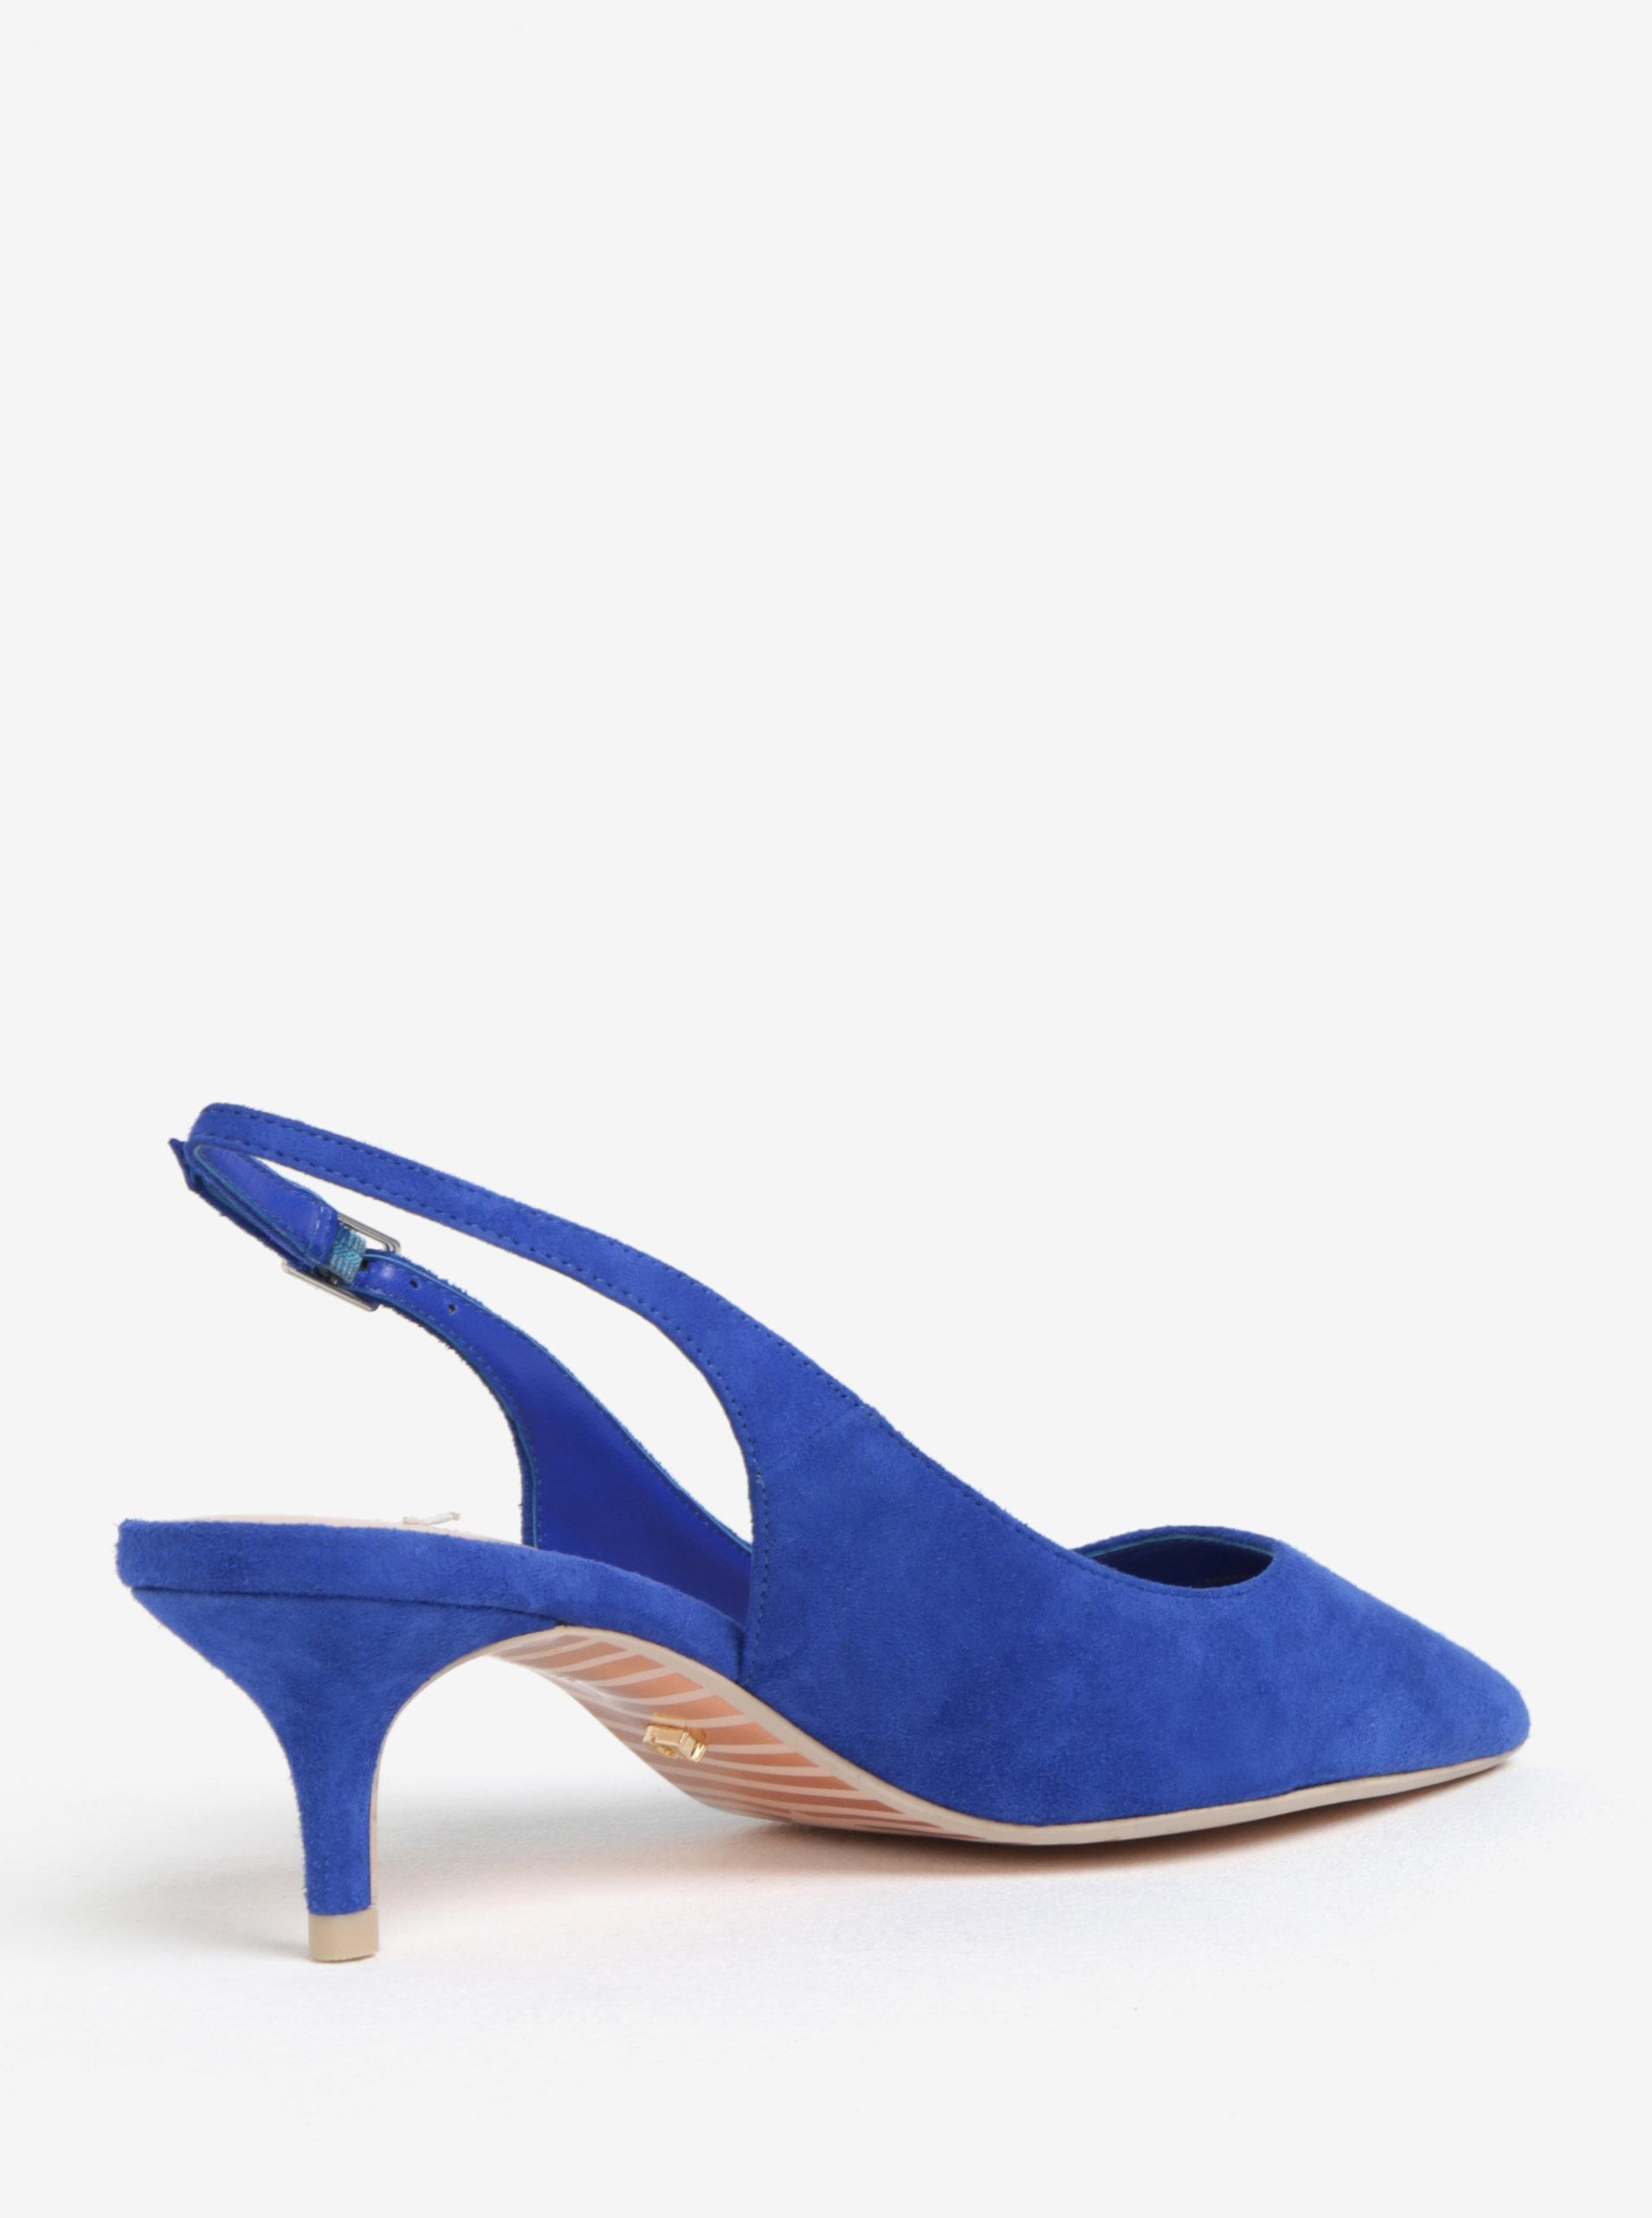 Modré semišové lodičky s otvorenou pätou Dune London Casandra ... 135e76ec6d